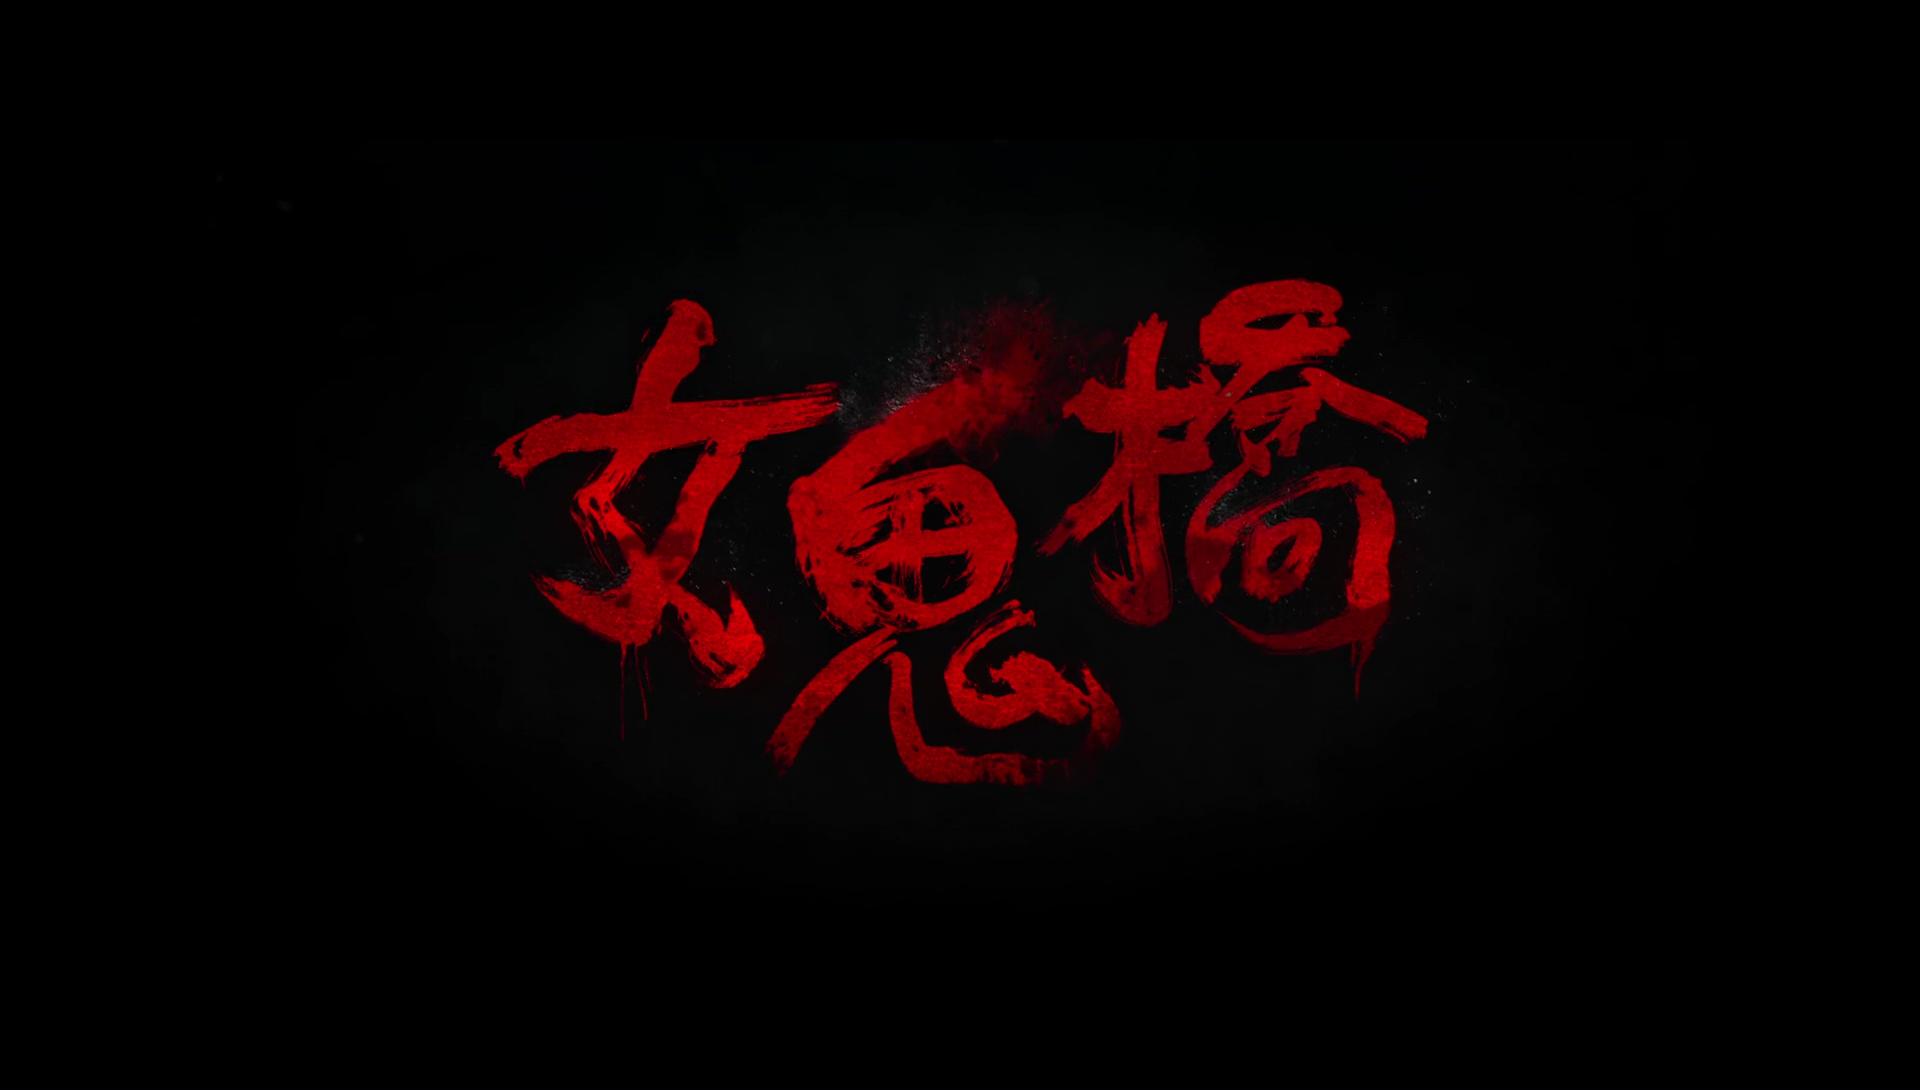 THE BRIDGE CURSE (女鬼橋) de Lester Hsi (2020)